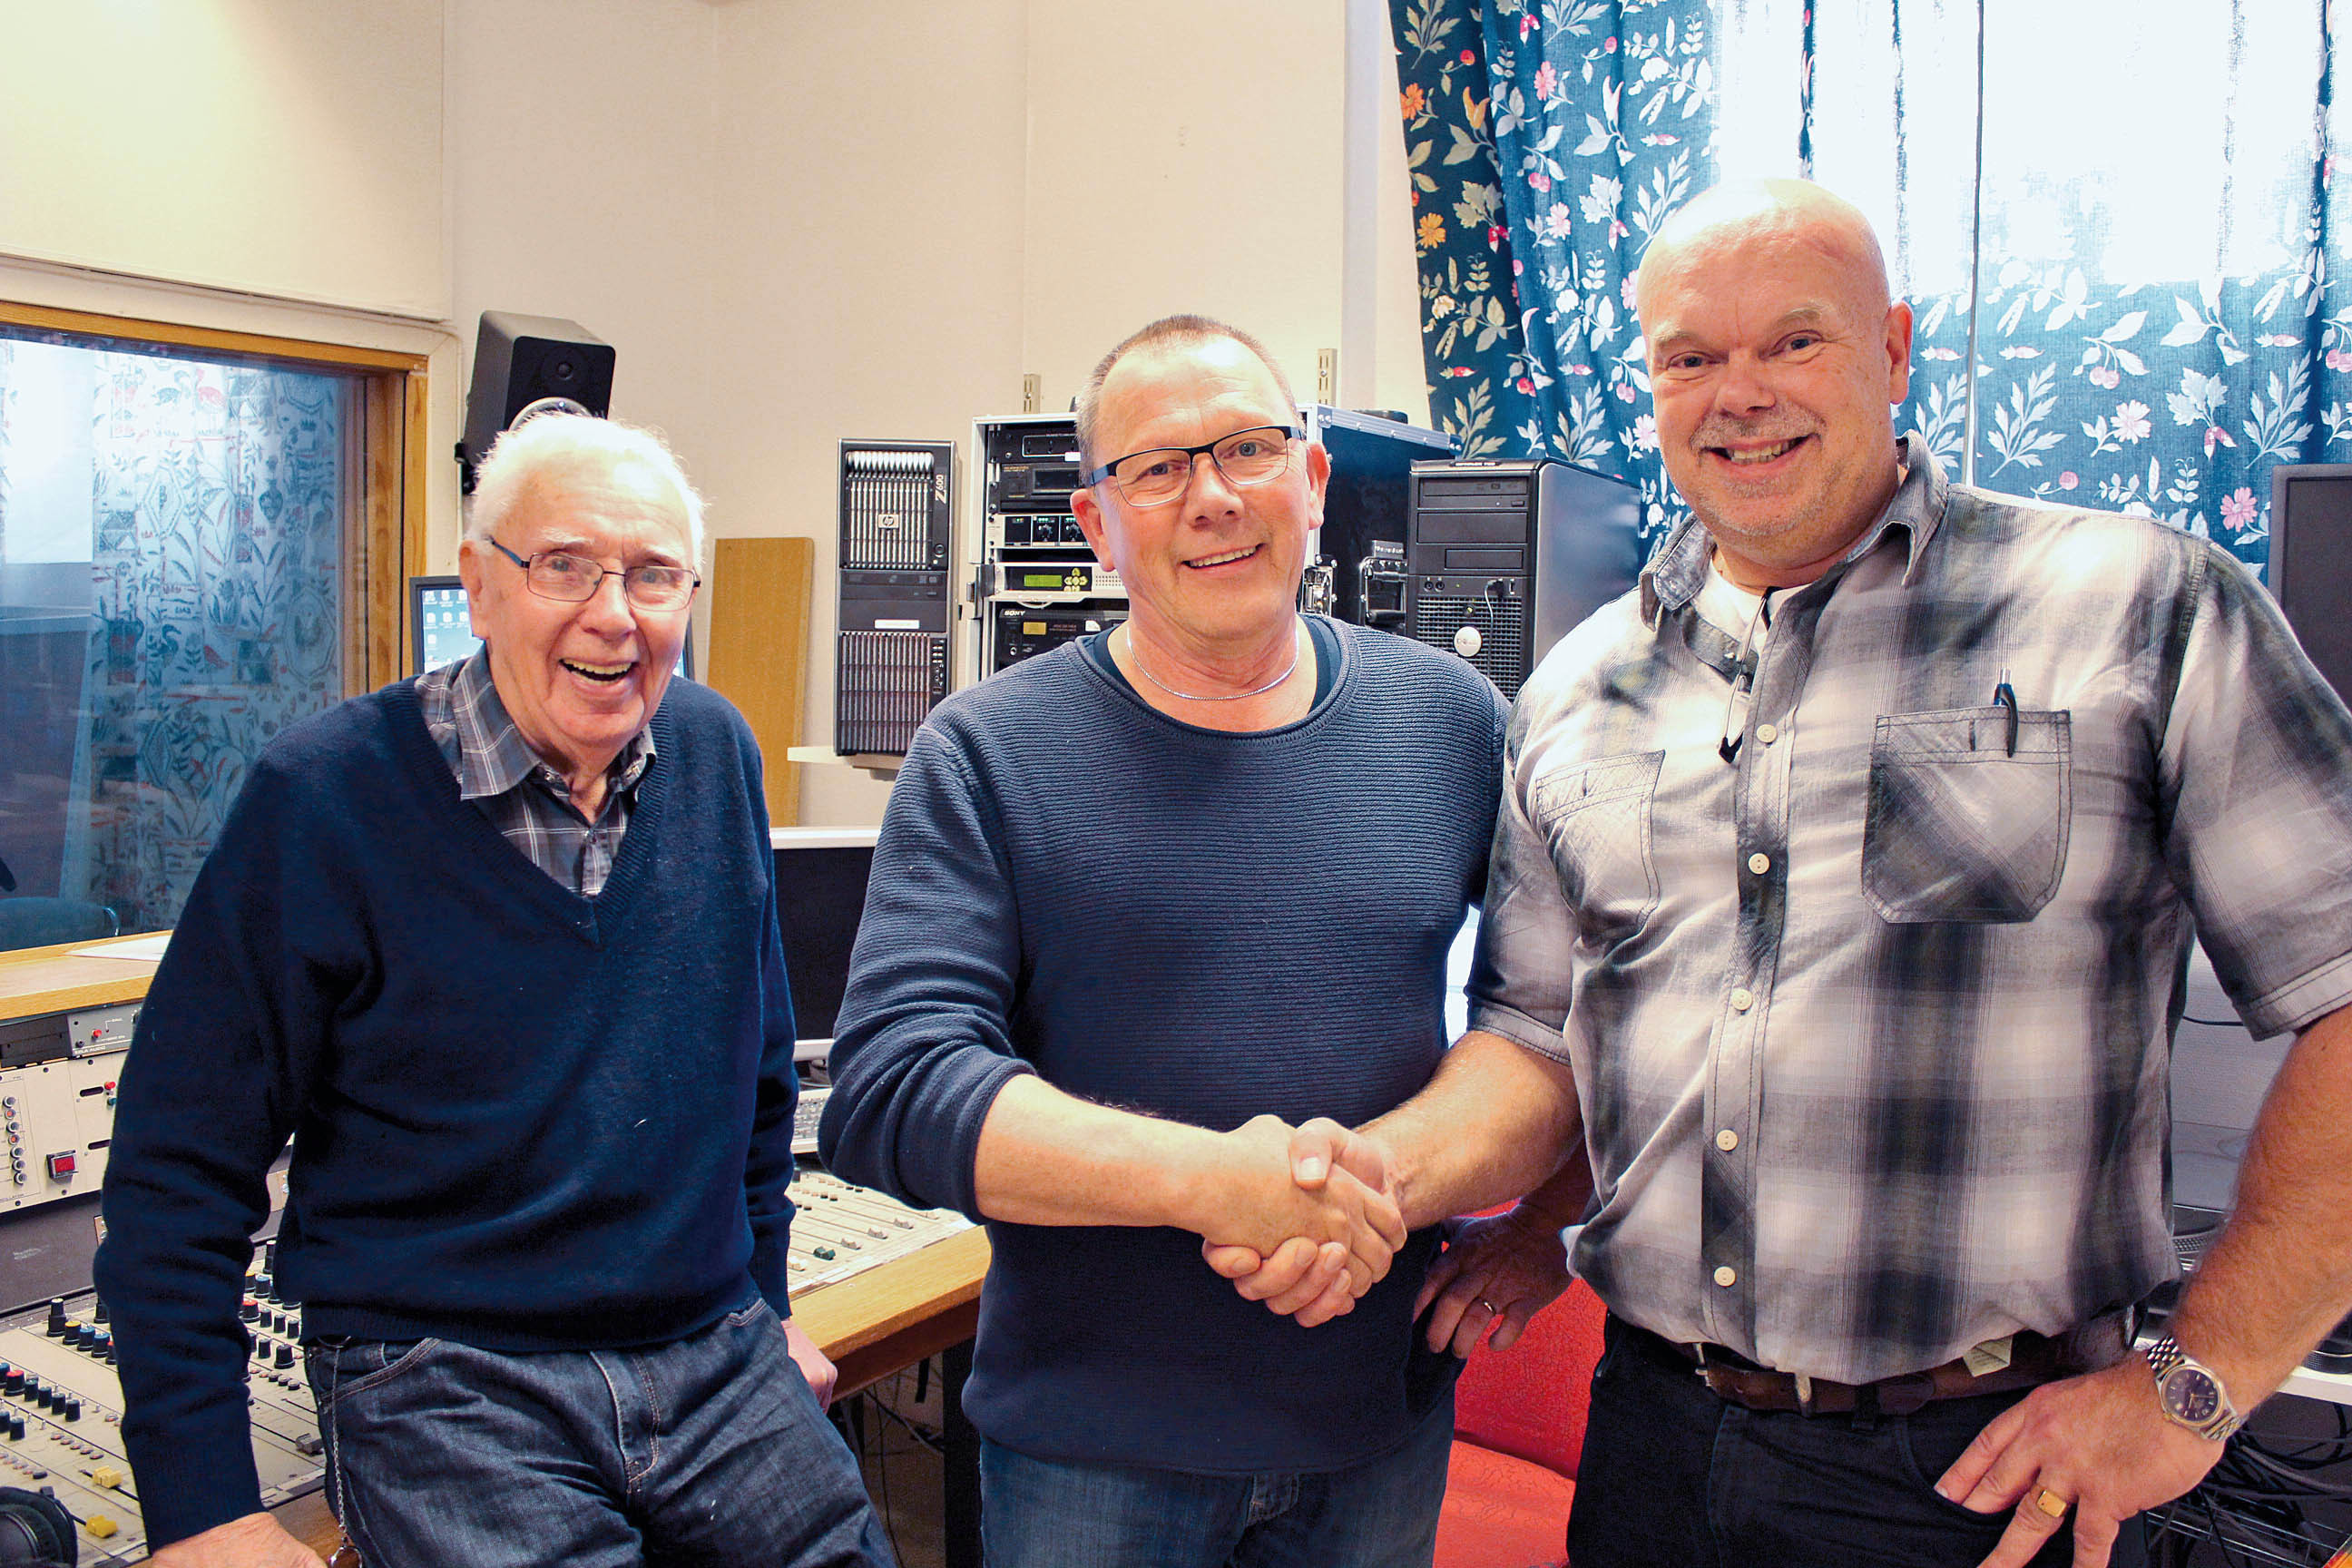 Lokala radiostationen Radio 102,7 Gävle expanderar